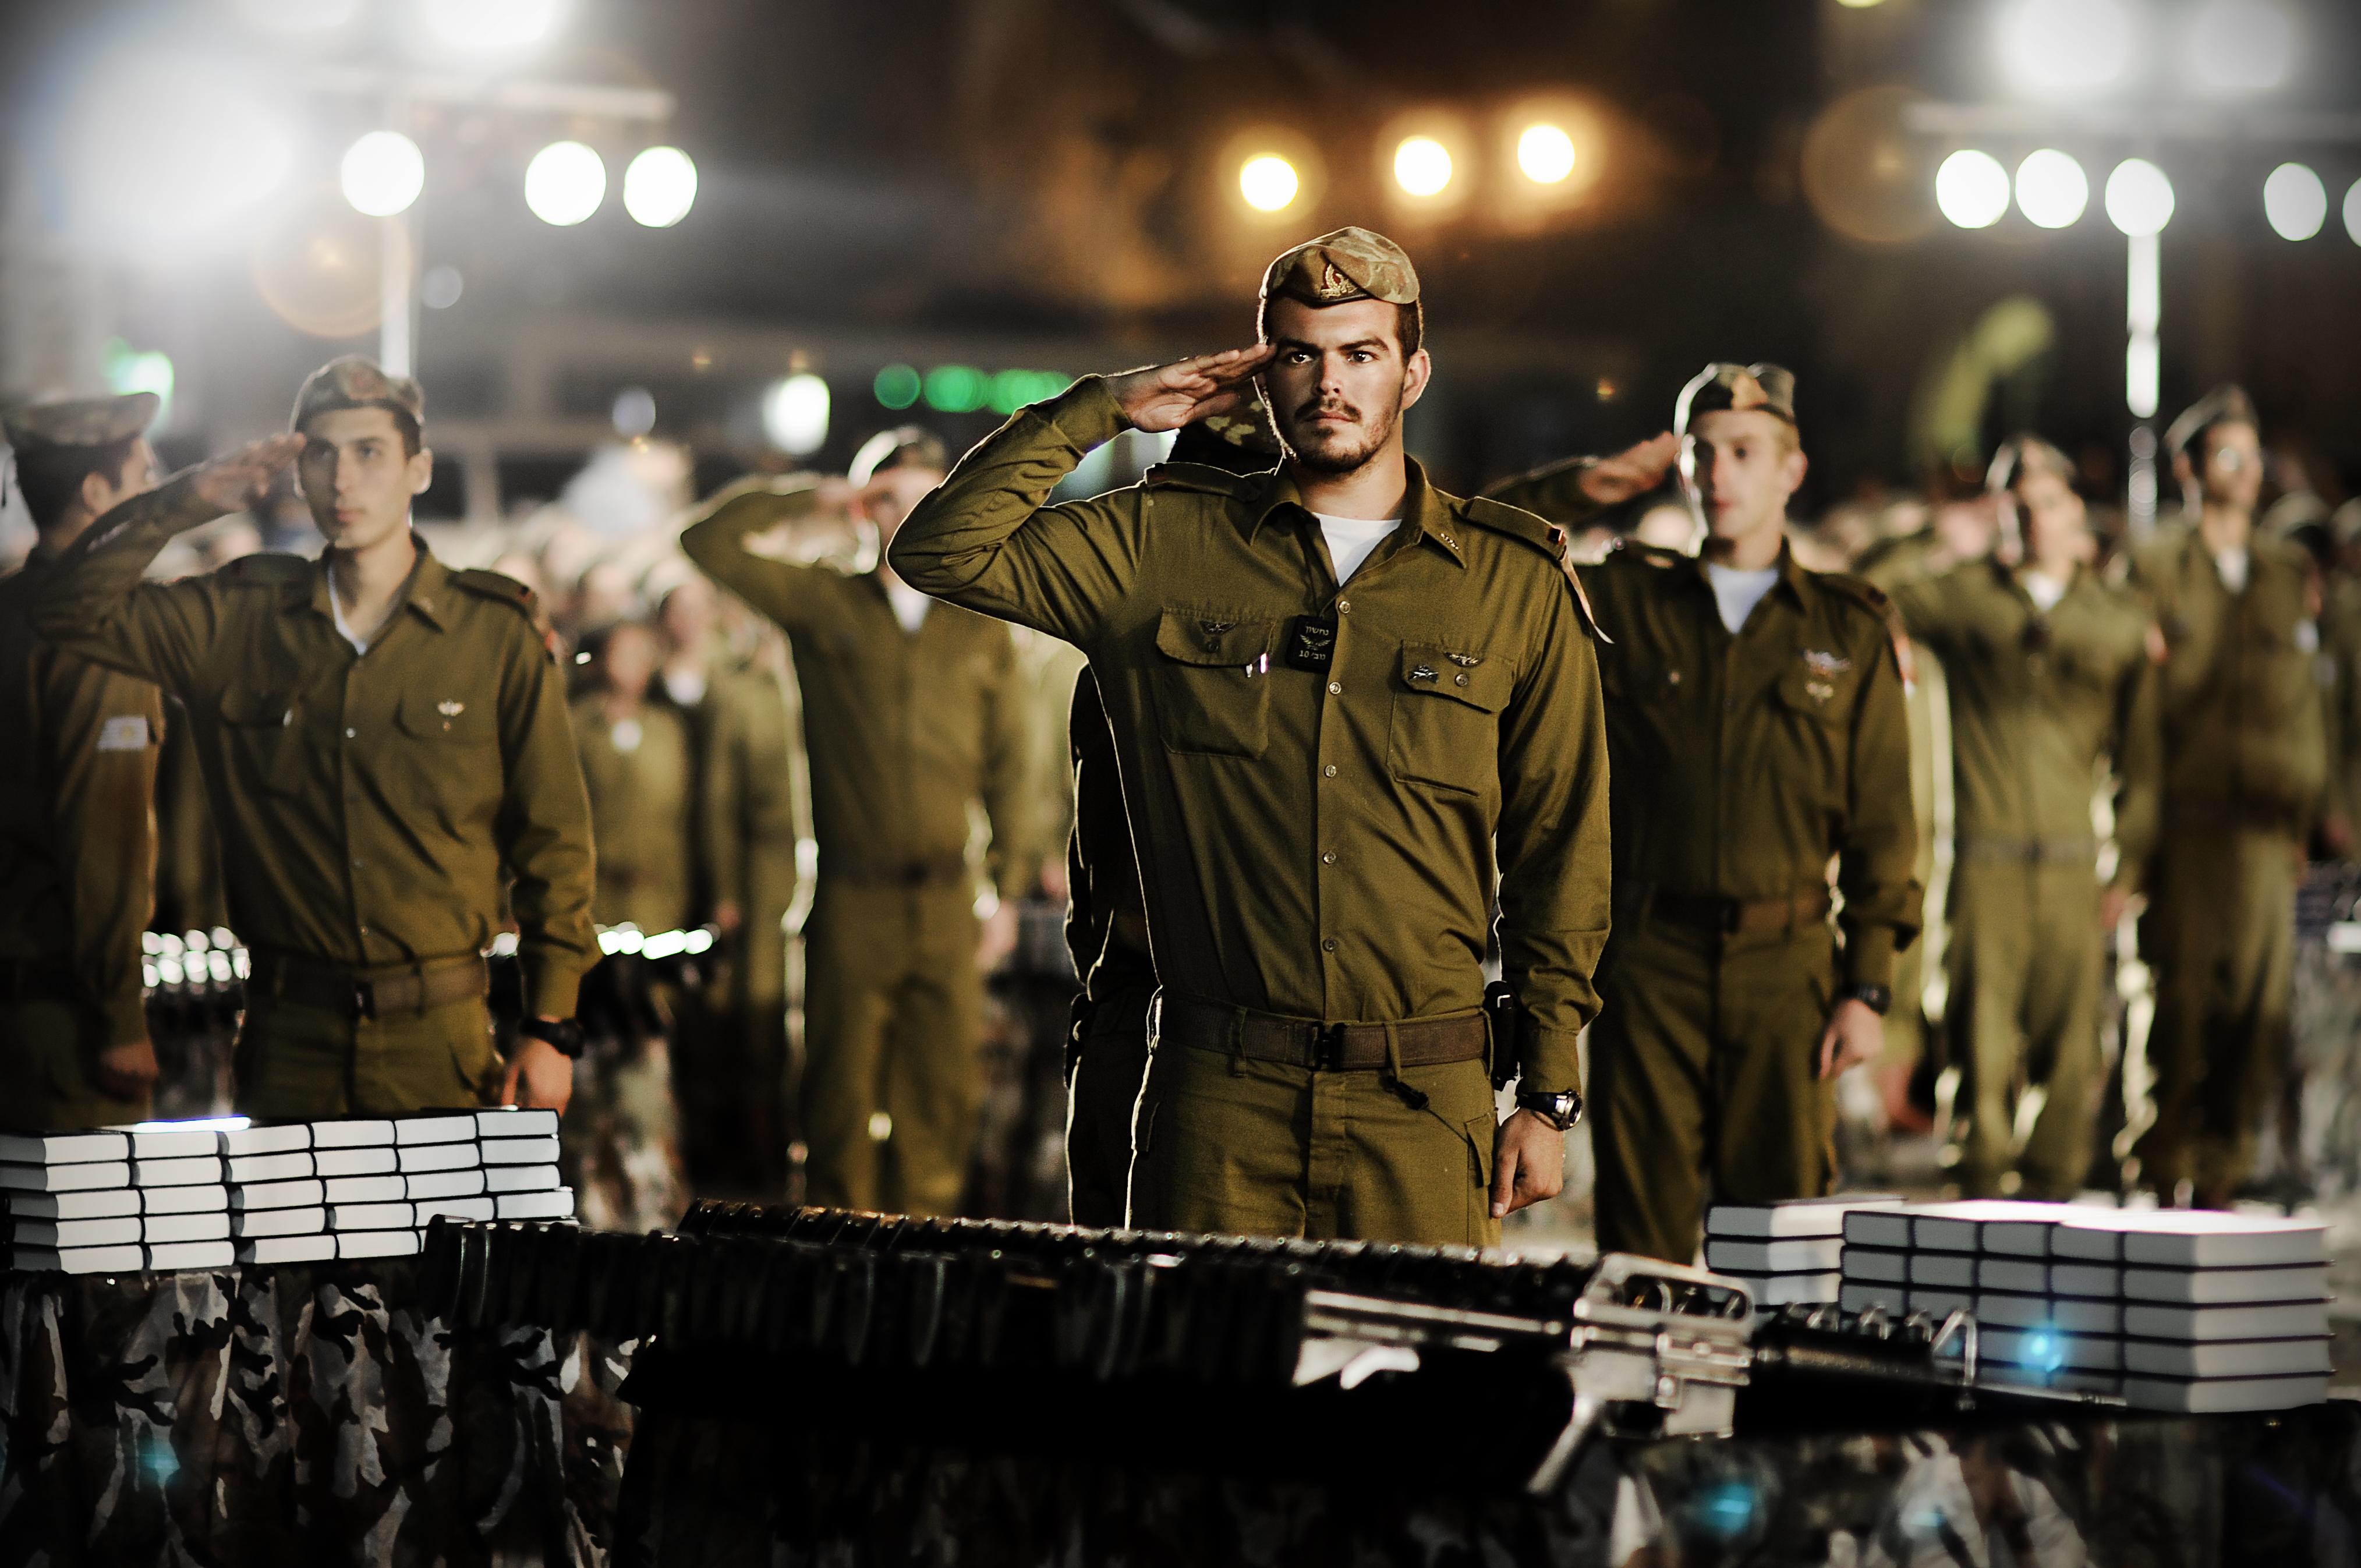 IDF salute